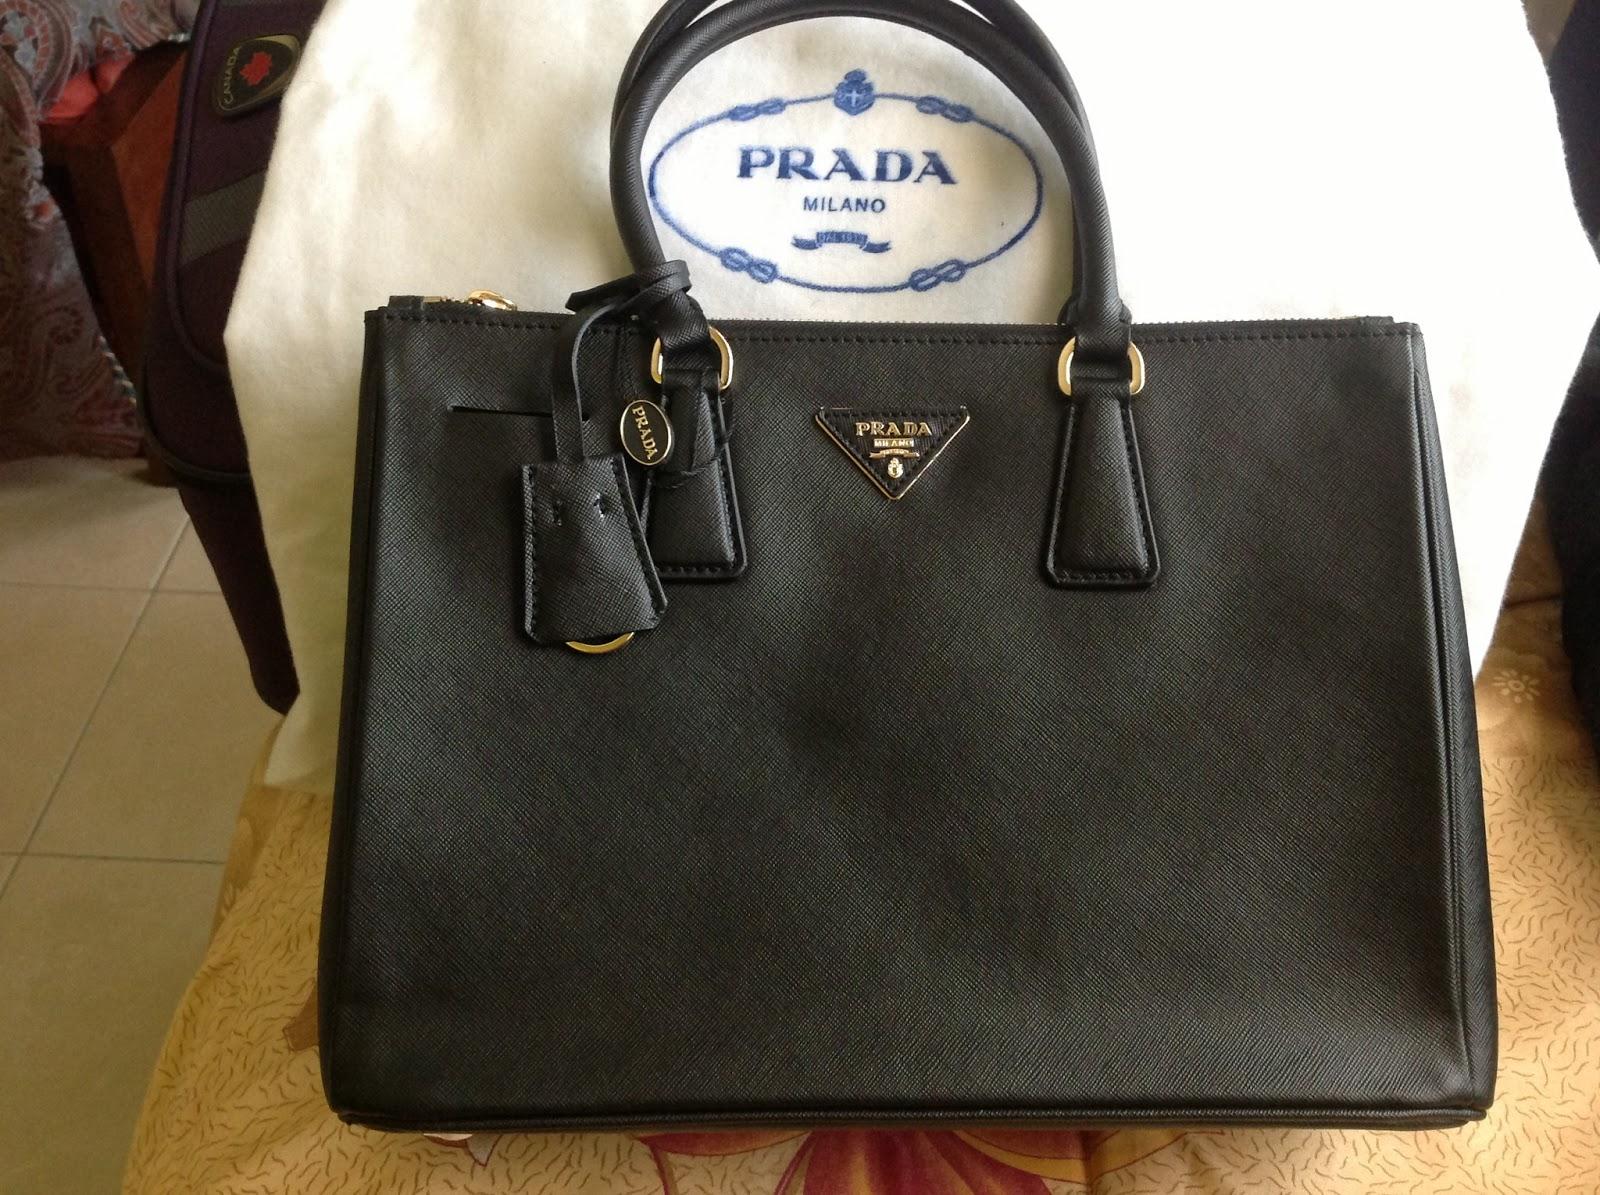 3a5ffa104726 Diary of a Trendaholic   My favorite purchase from Dubai  Prada